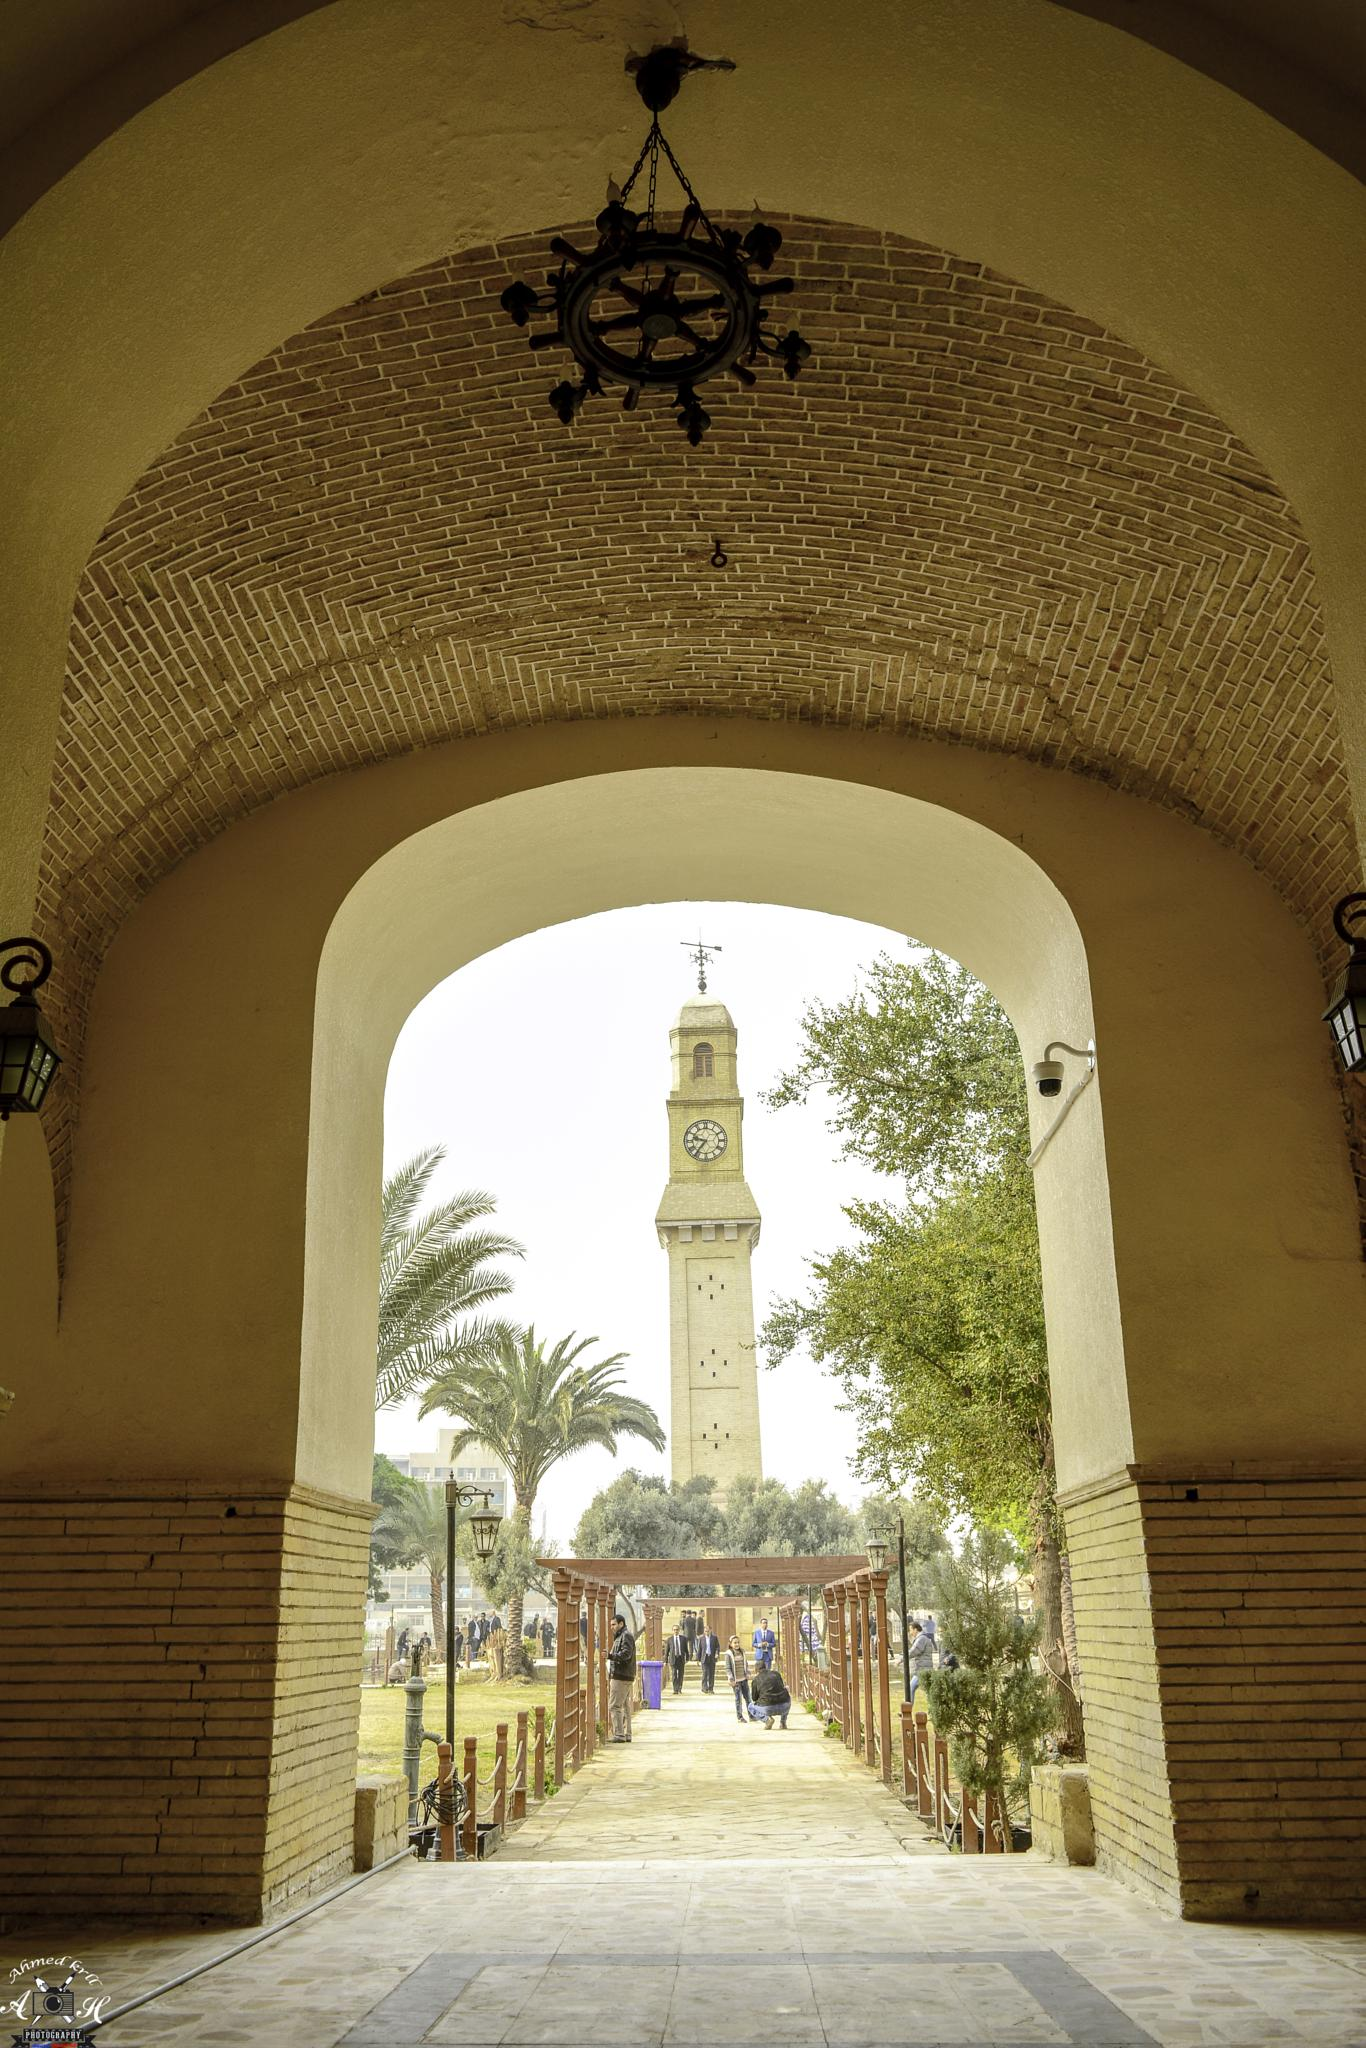 Hour Qishleh by ahmedkrll